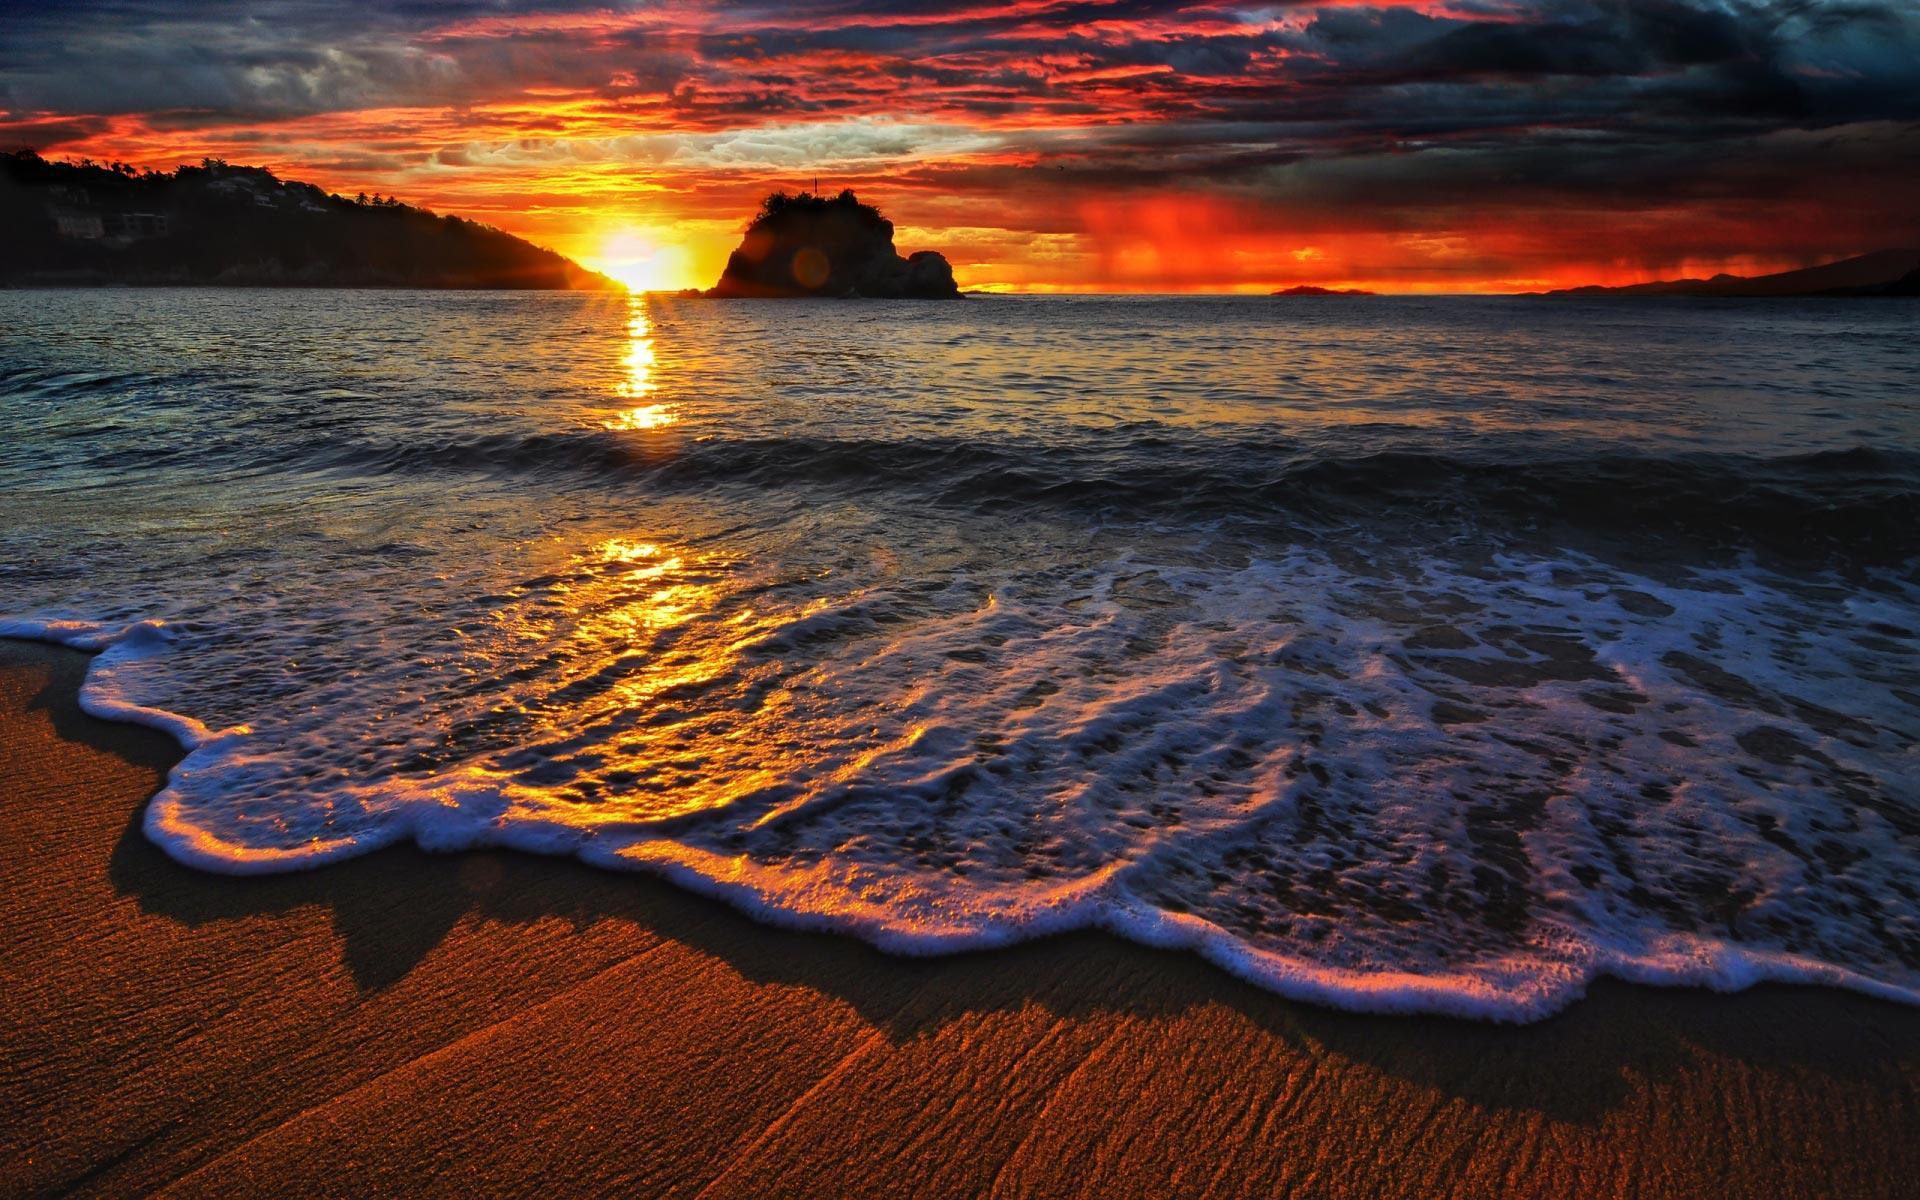 tangolunda-bay-mexico-sea-beach-sand-1920x1200.jpg